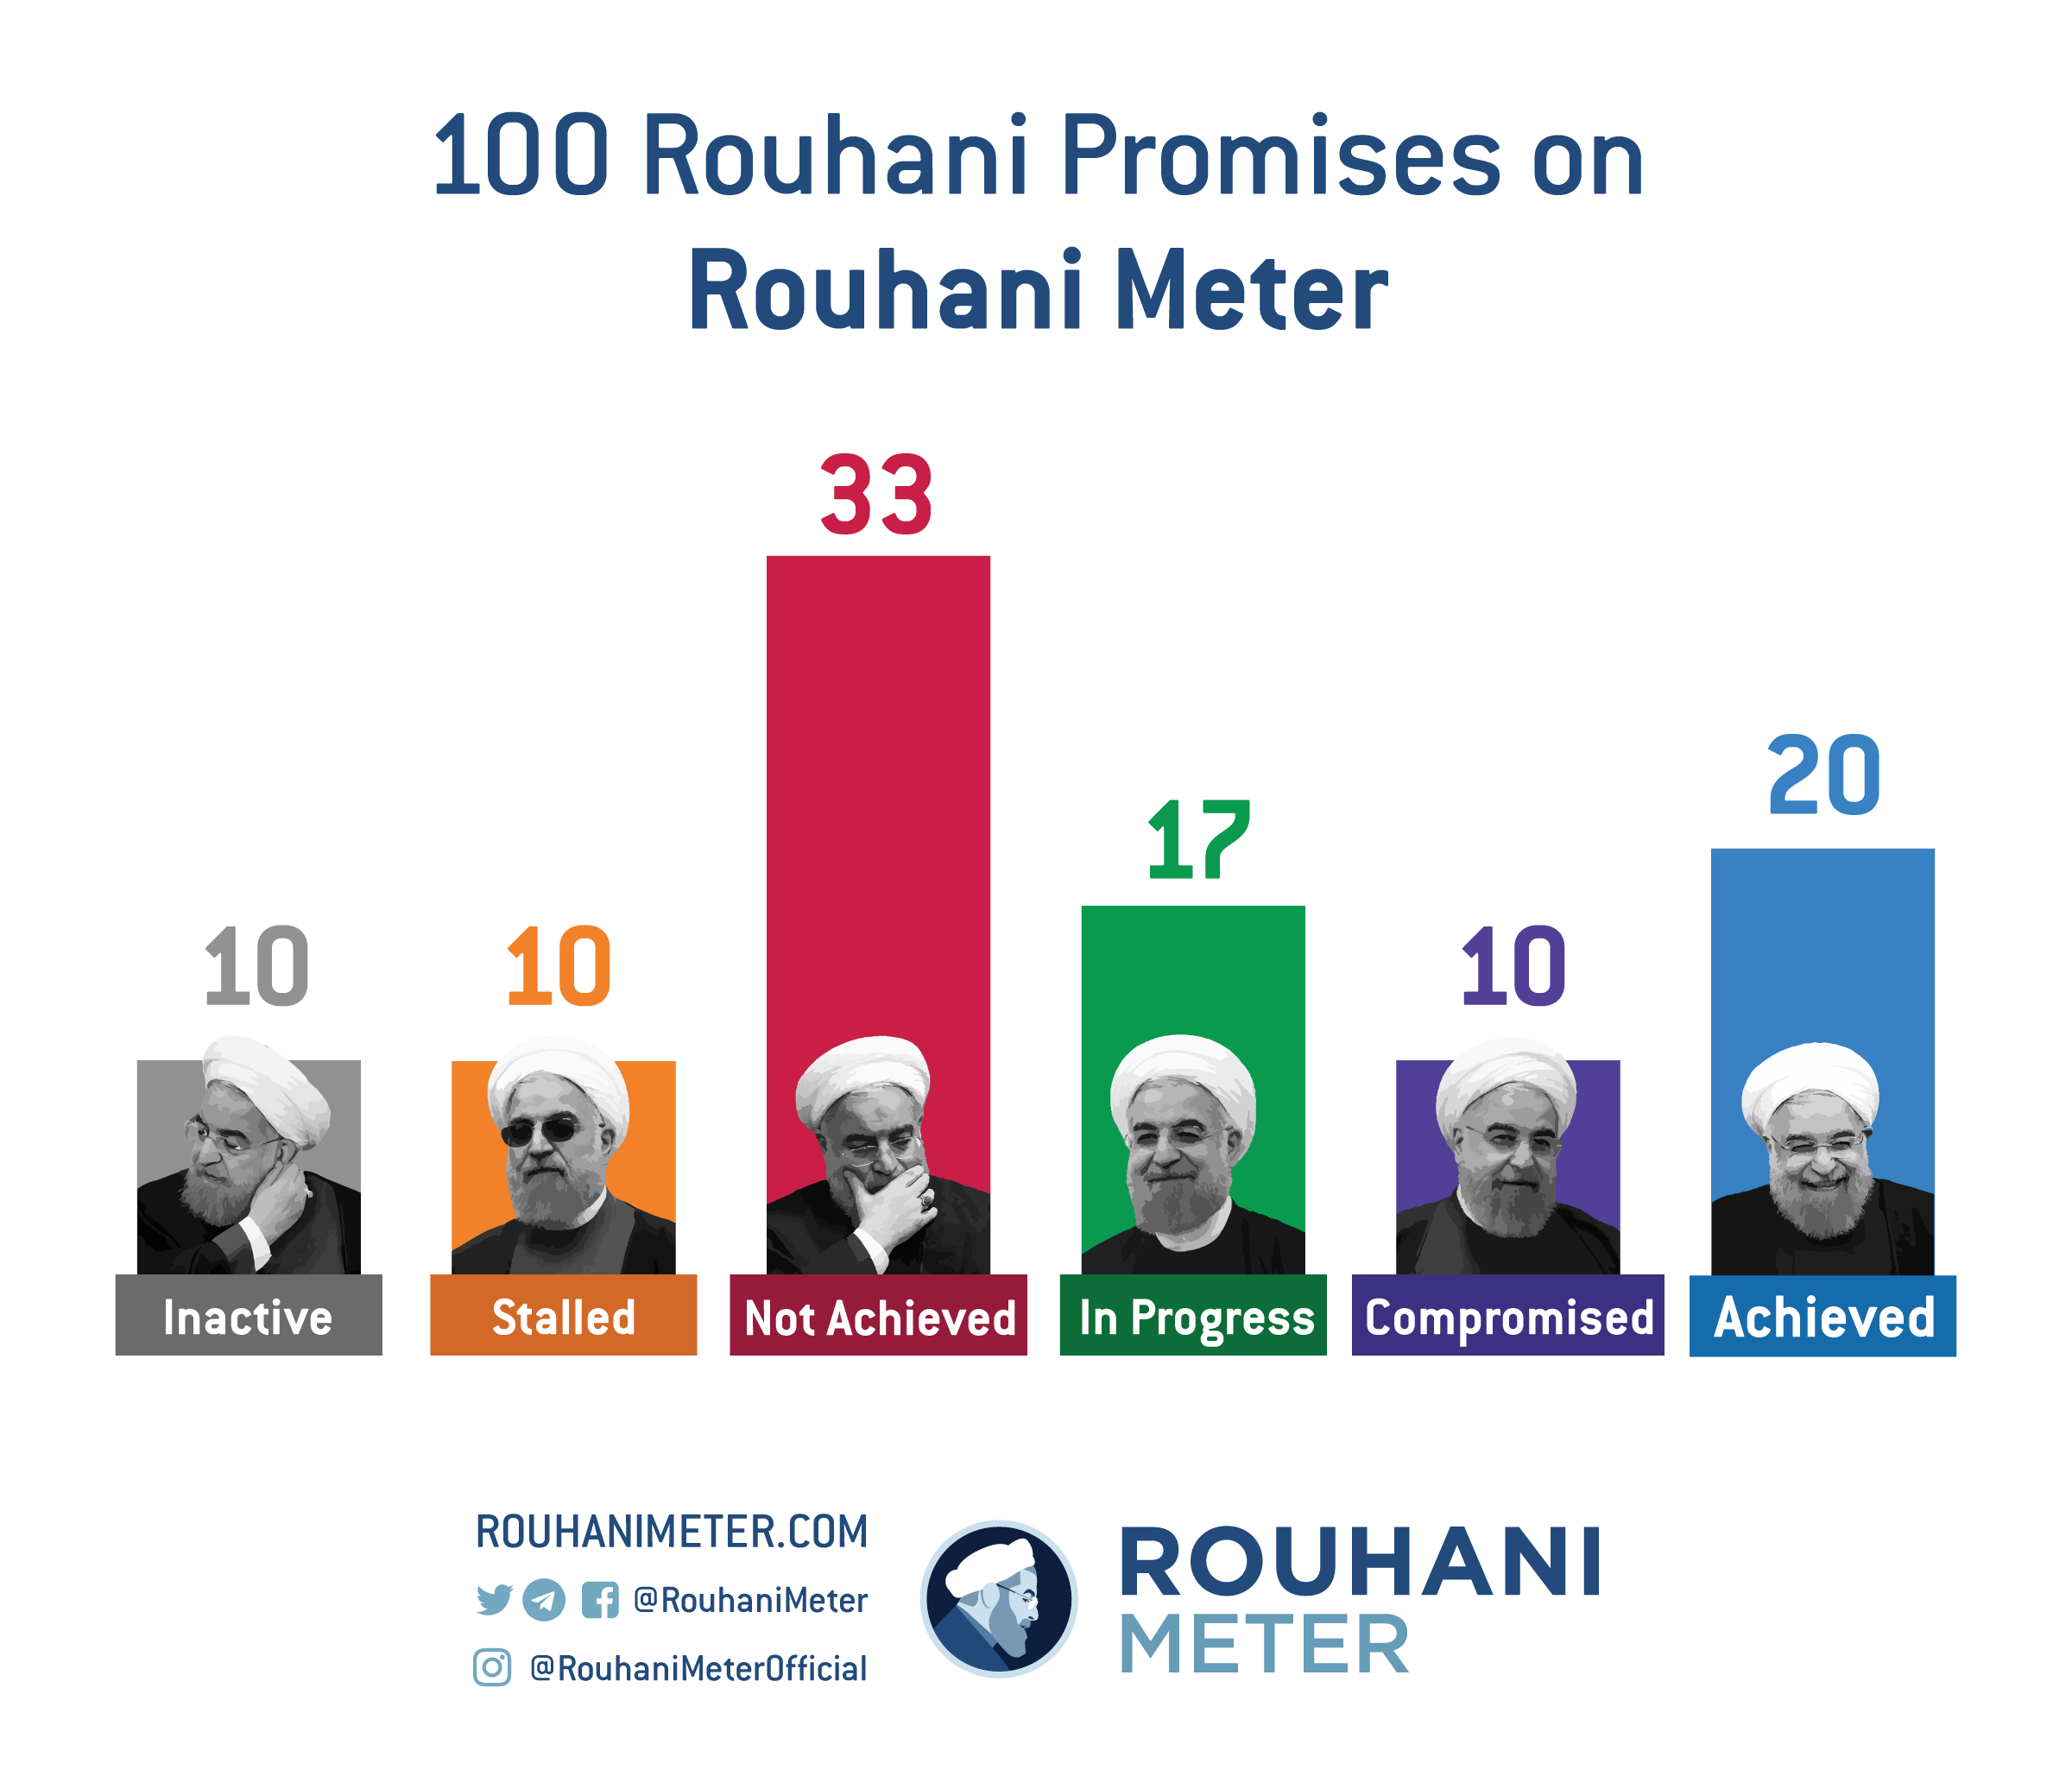 RM-AnnualRepor2018-promises-stats-EN